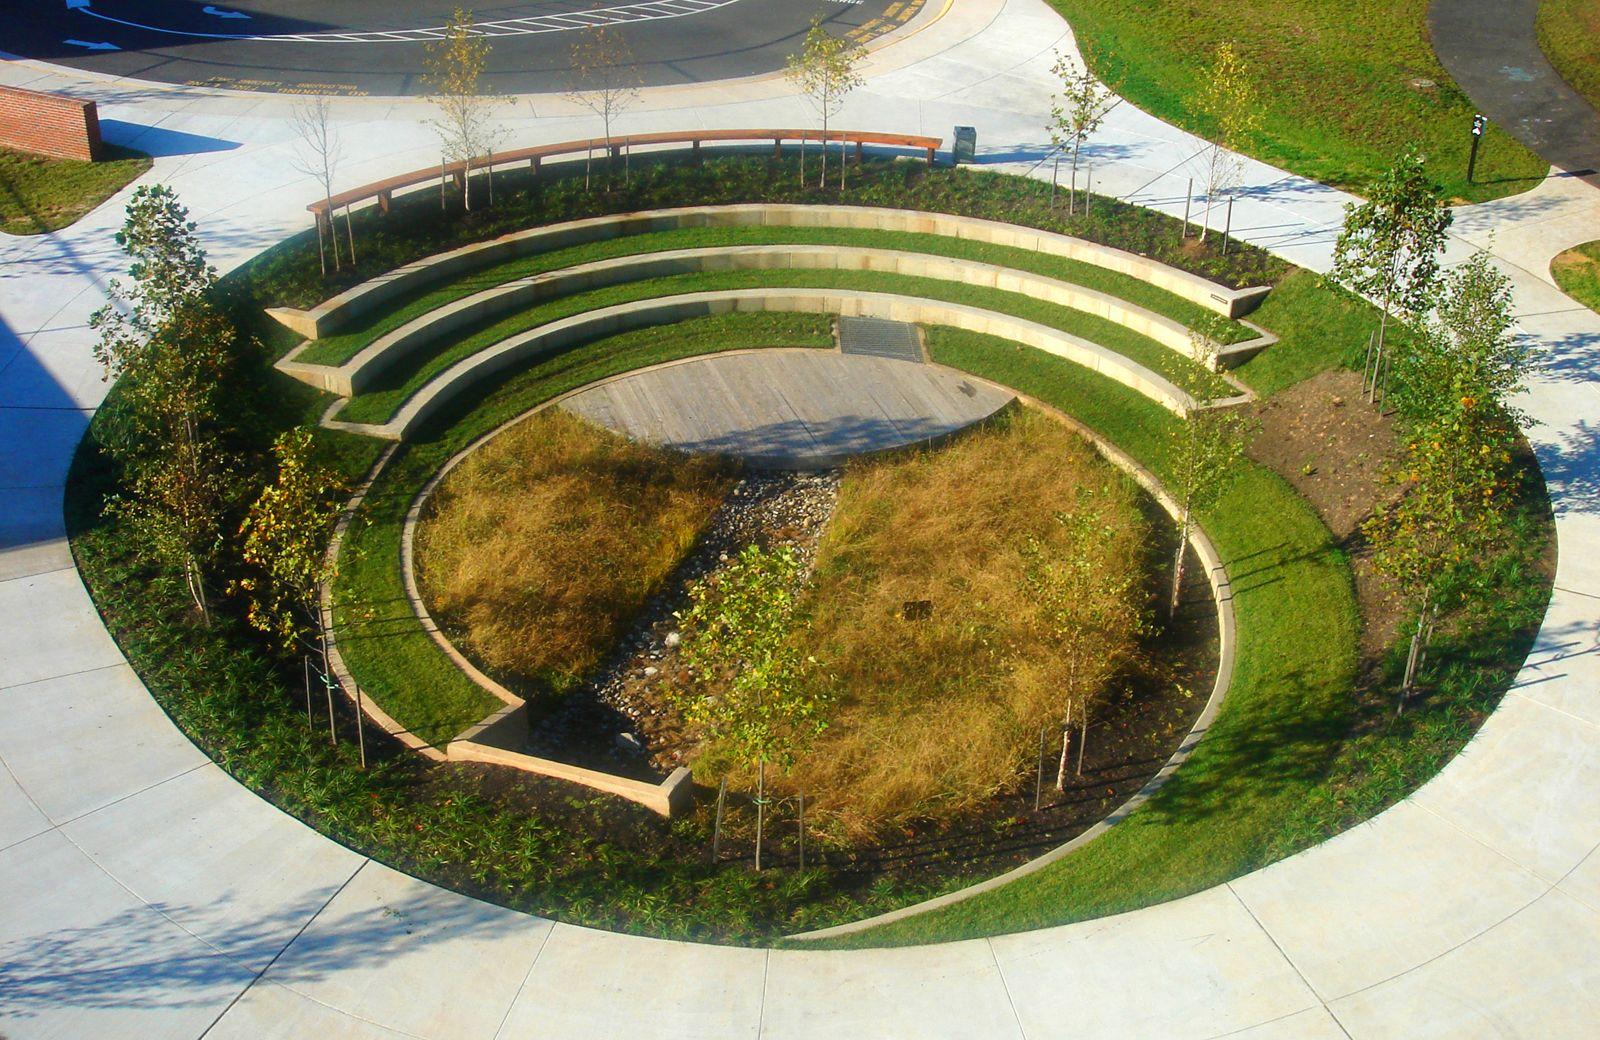 Amphitheater Bioswale Manassas Park Elementary School Virginia Vmdo Architects Dwell Landscape Architecture Landscape Architecture Design Landscape Design